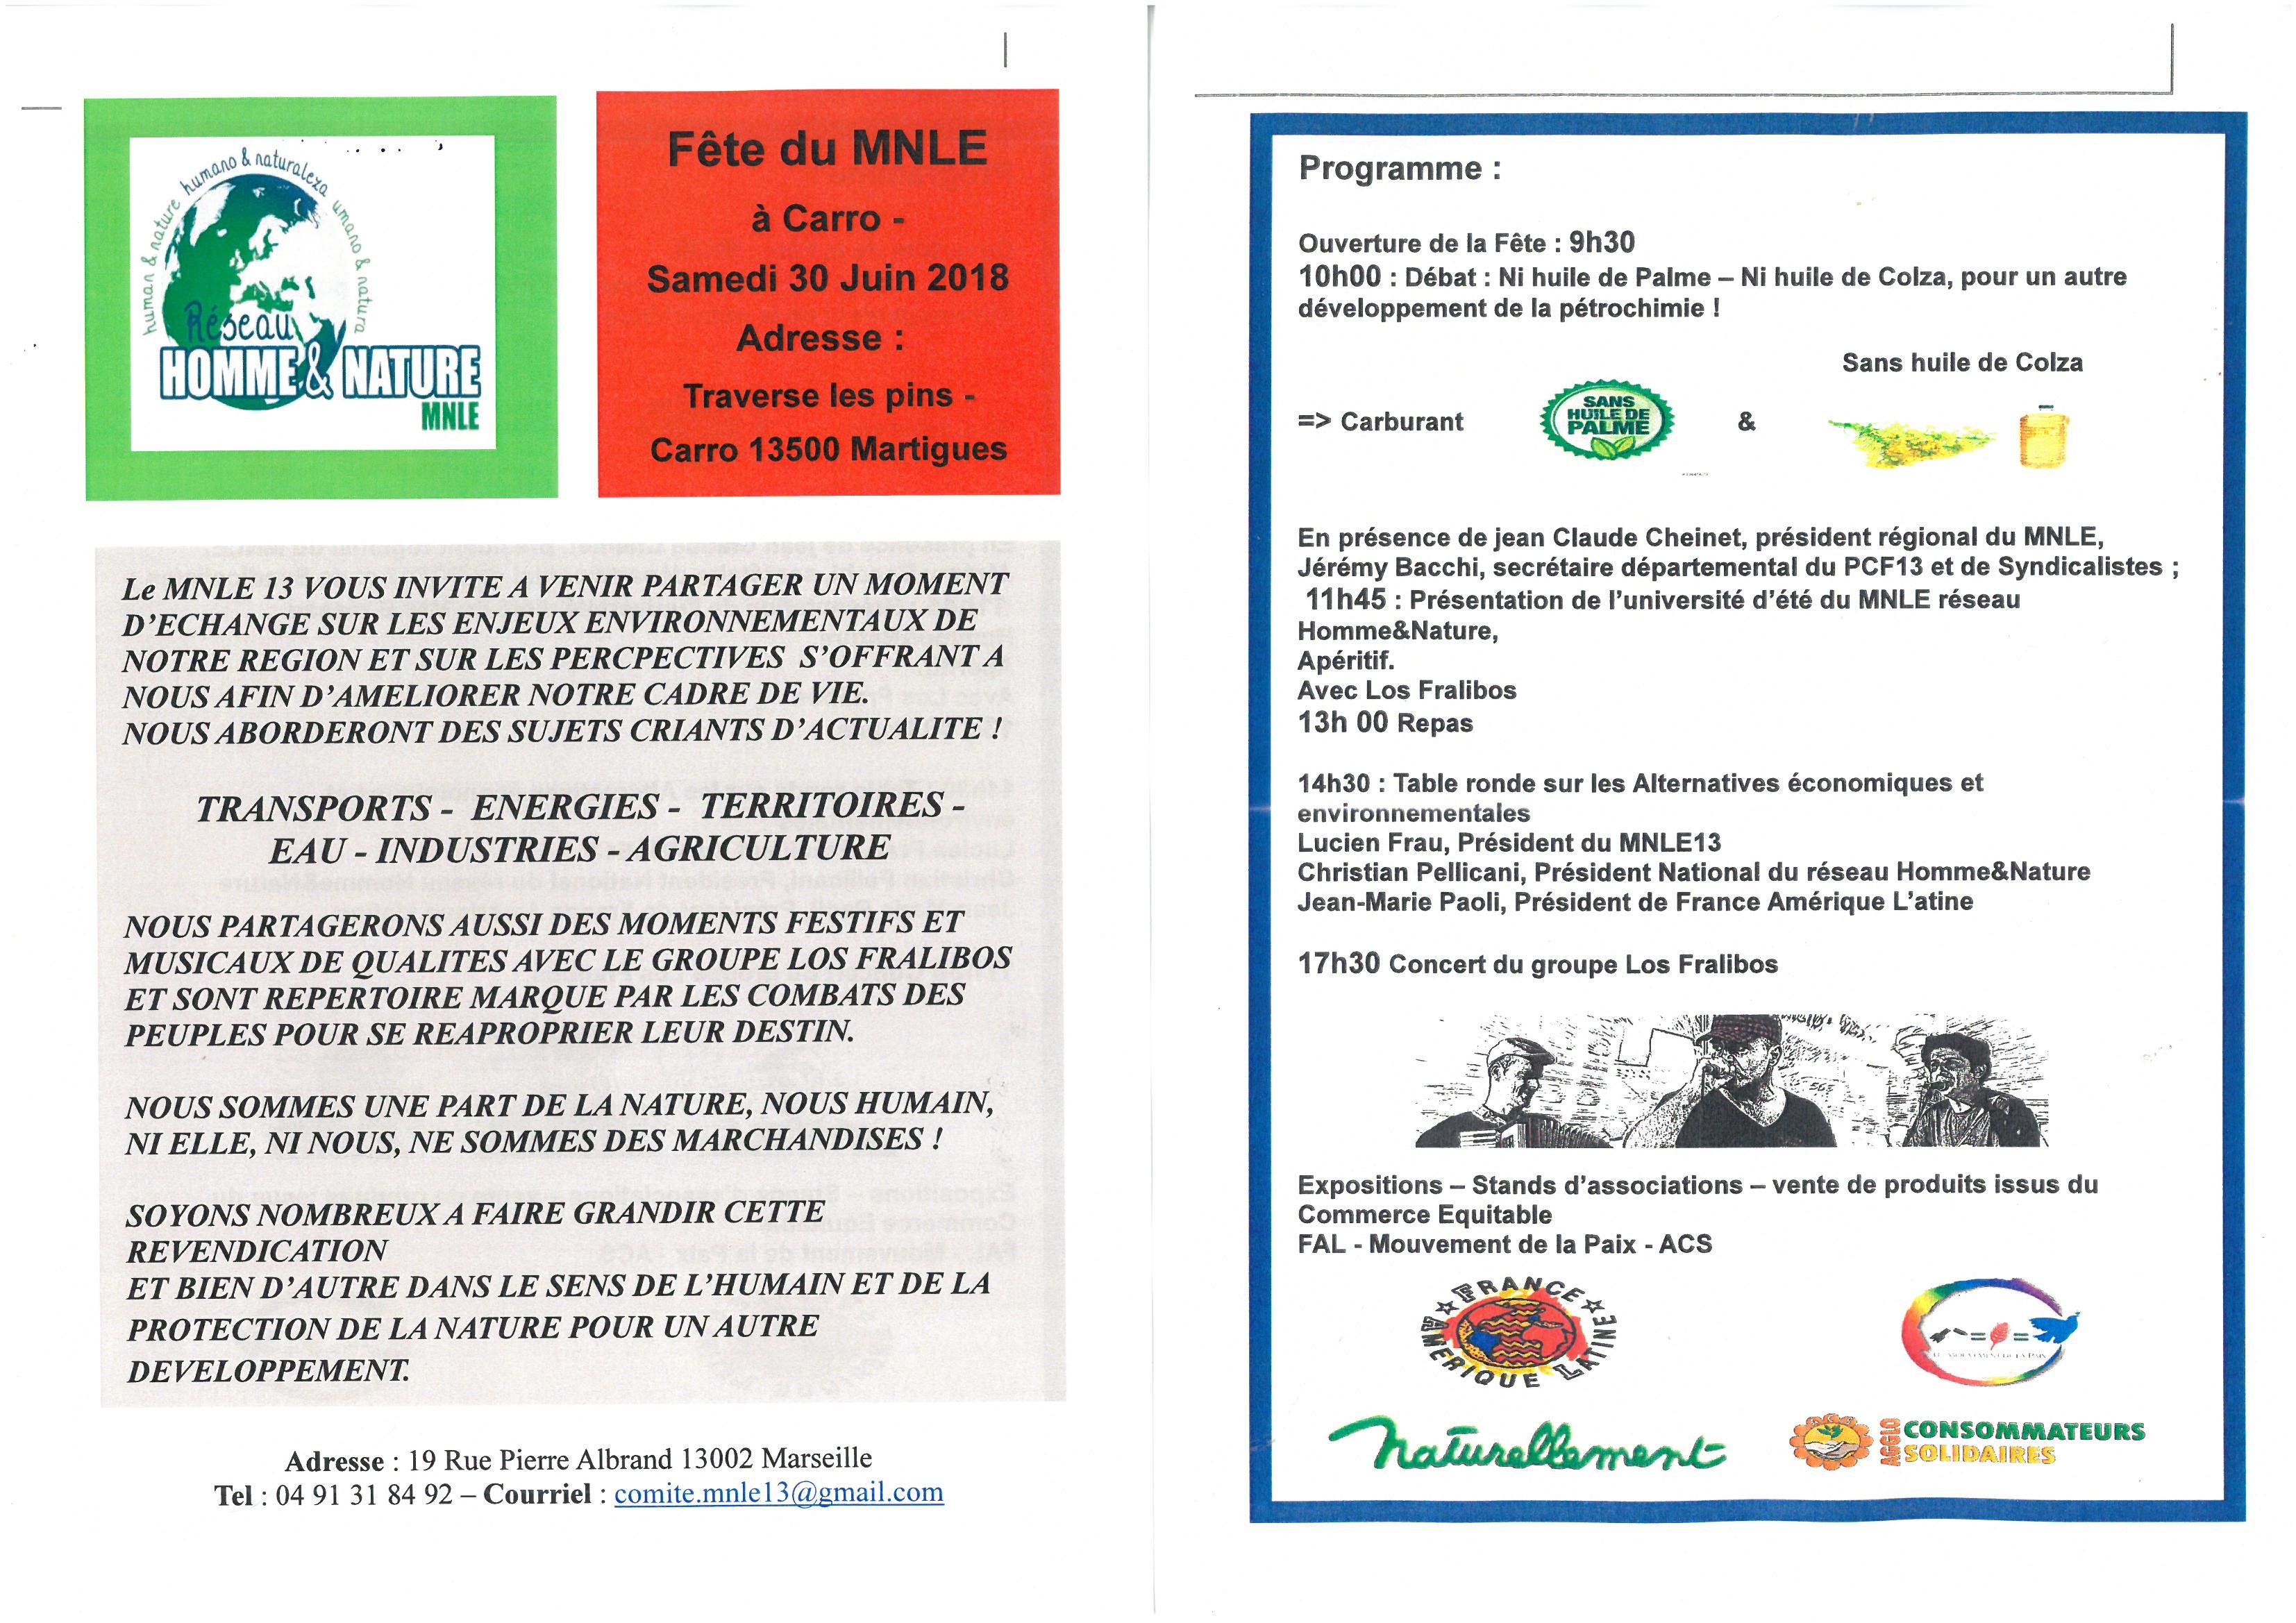 Fête du MNLE à CARRO, commune de Martigues,  samedi 30 juin 2018